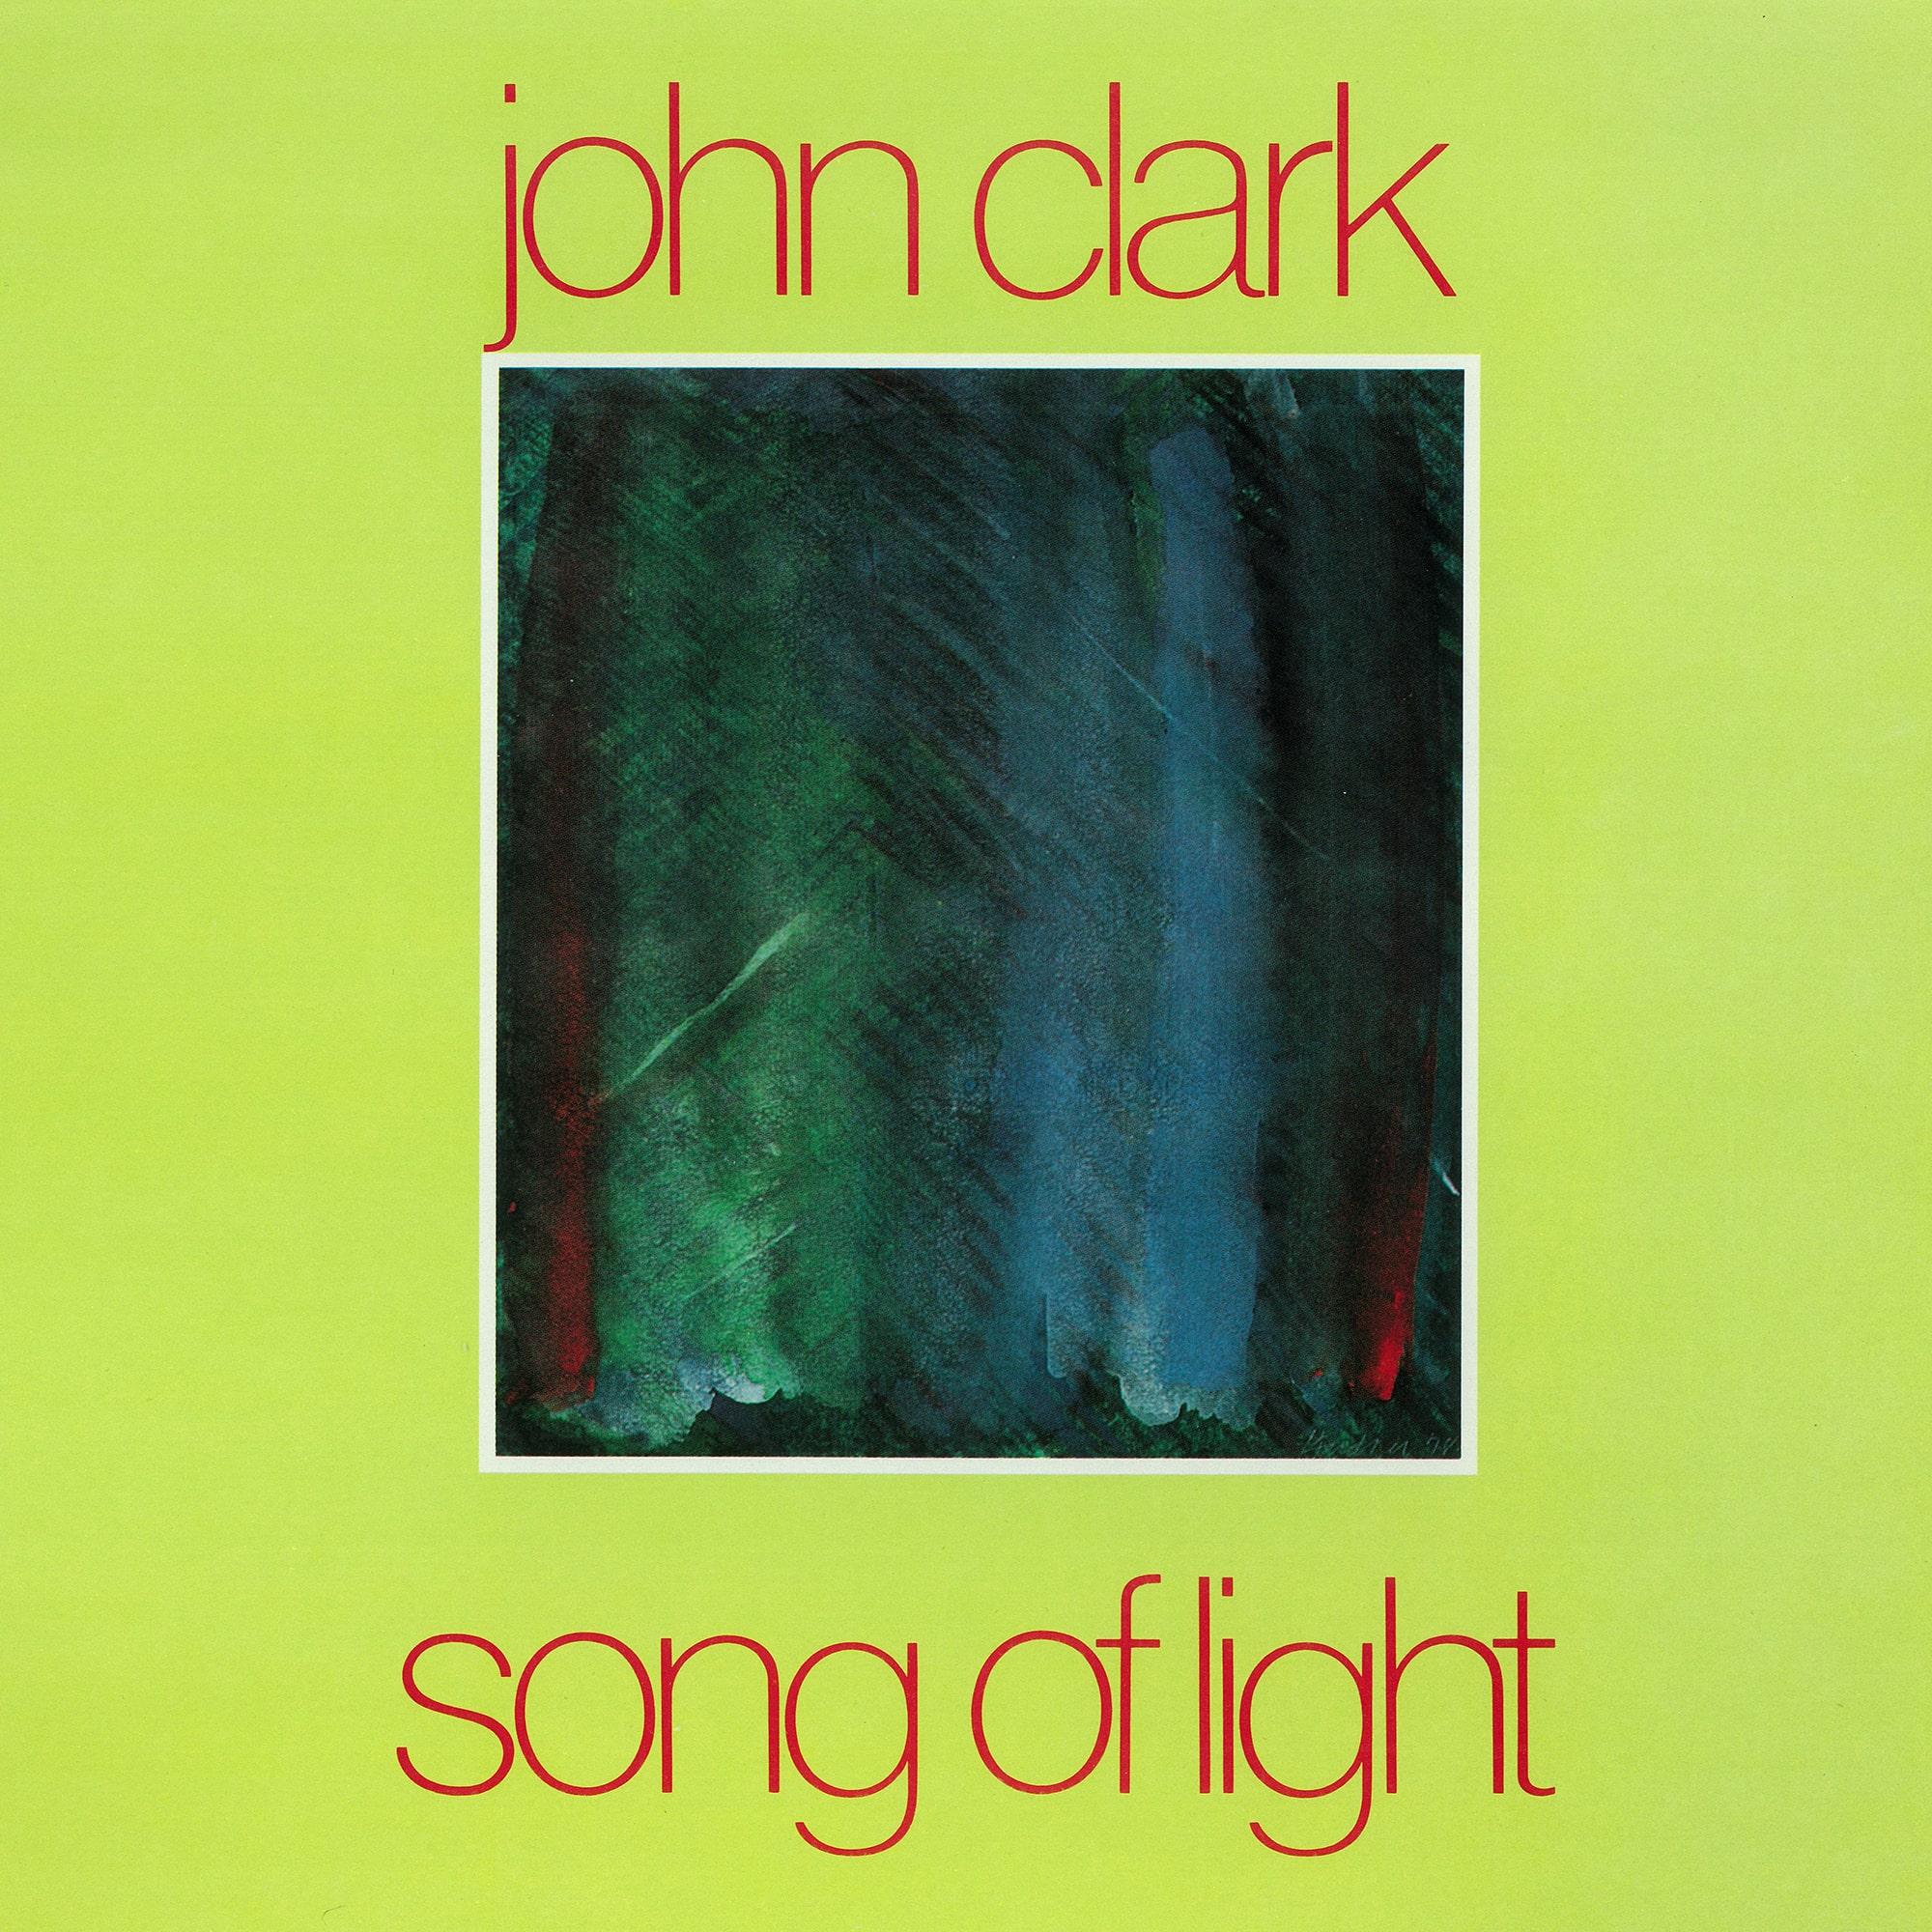 Song of Light LP | Hidden Meaning Music | French horn music